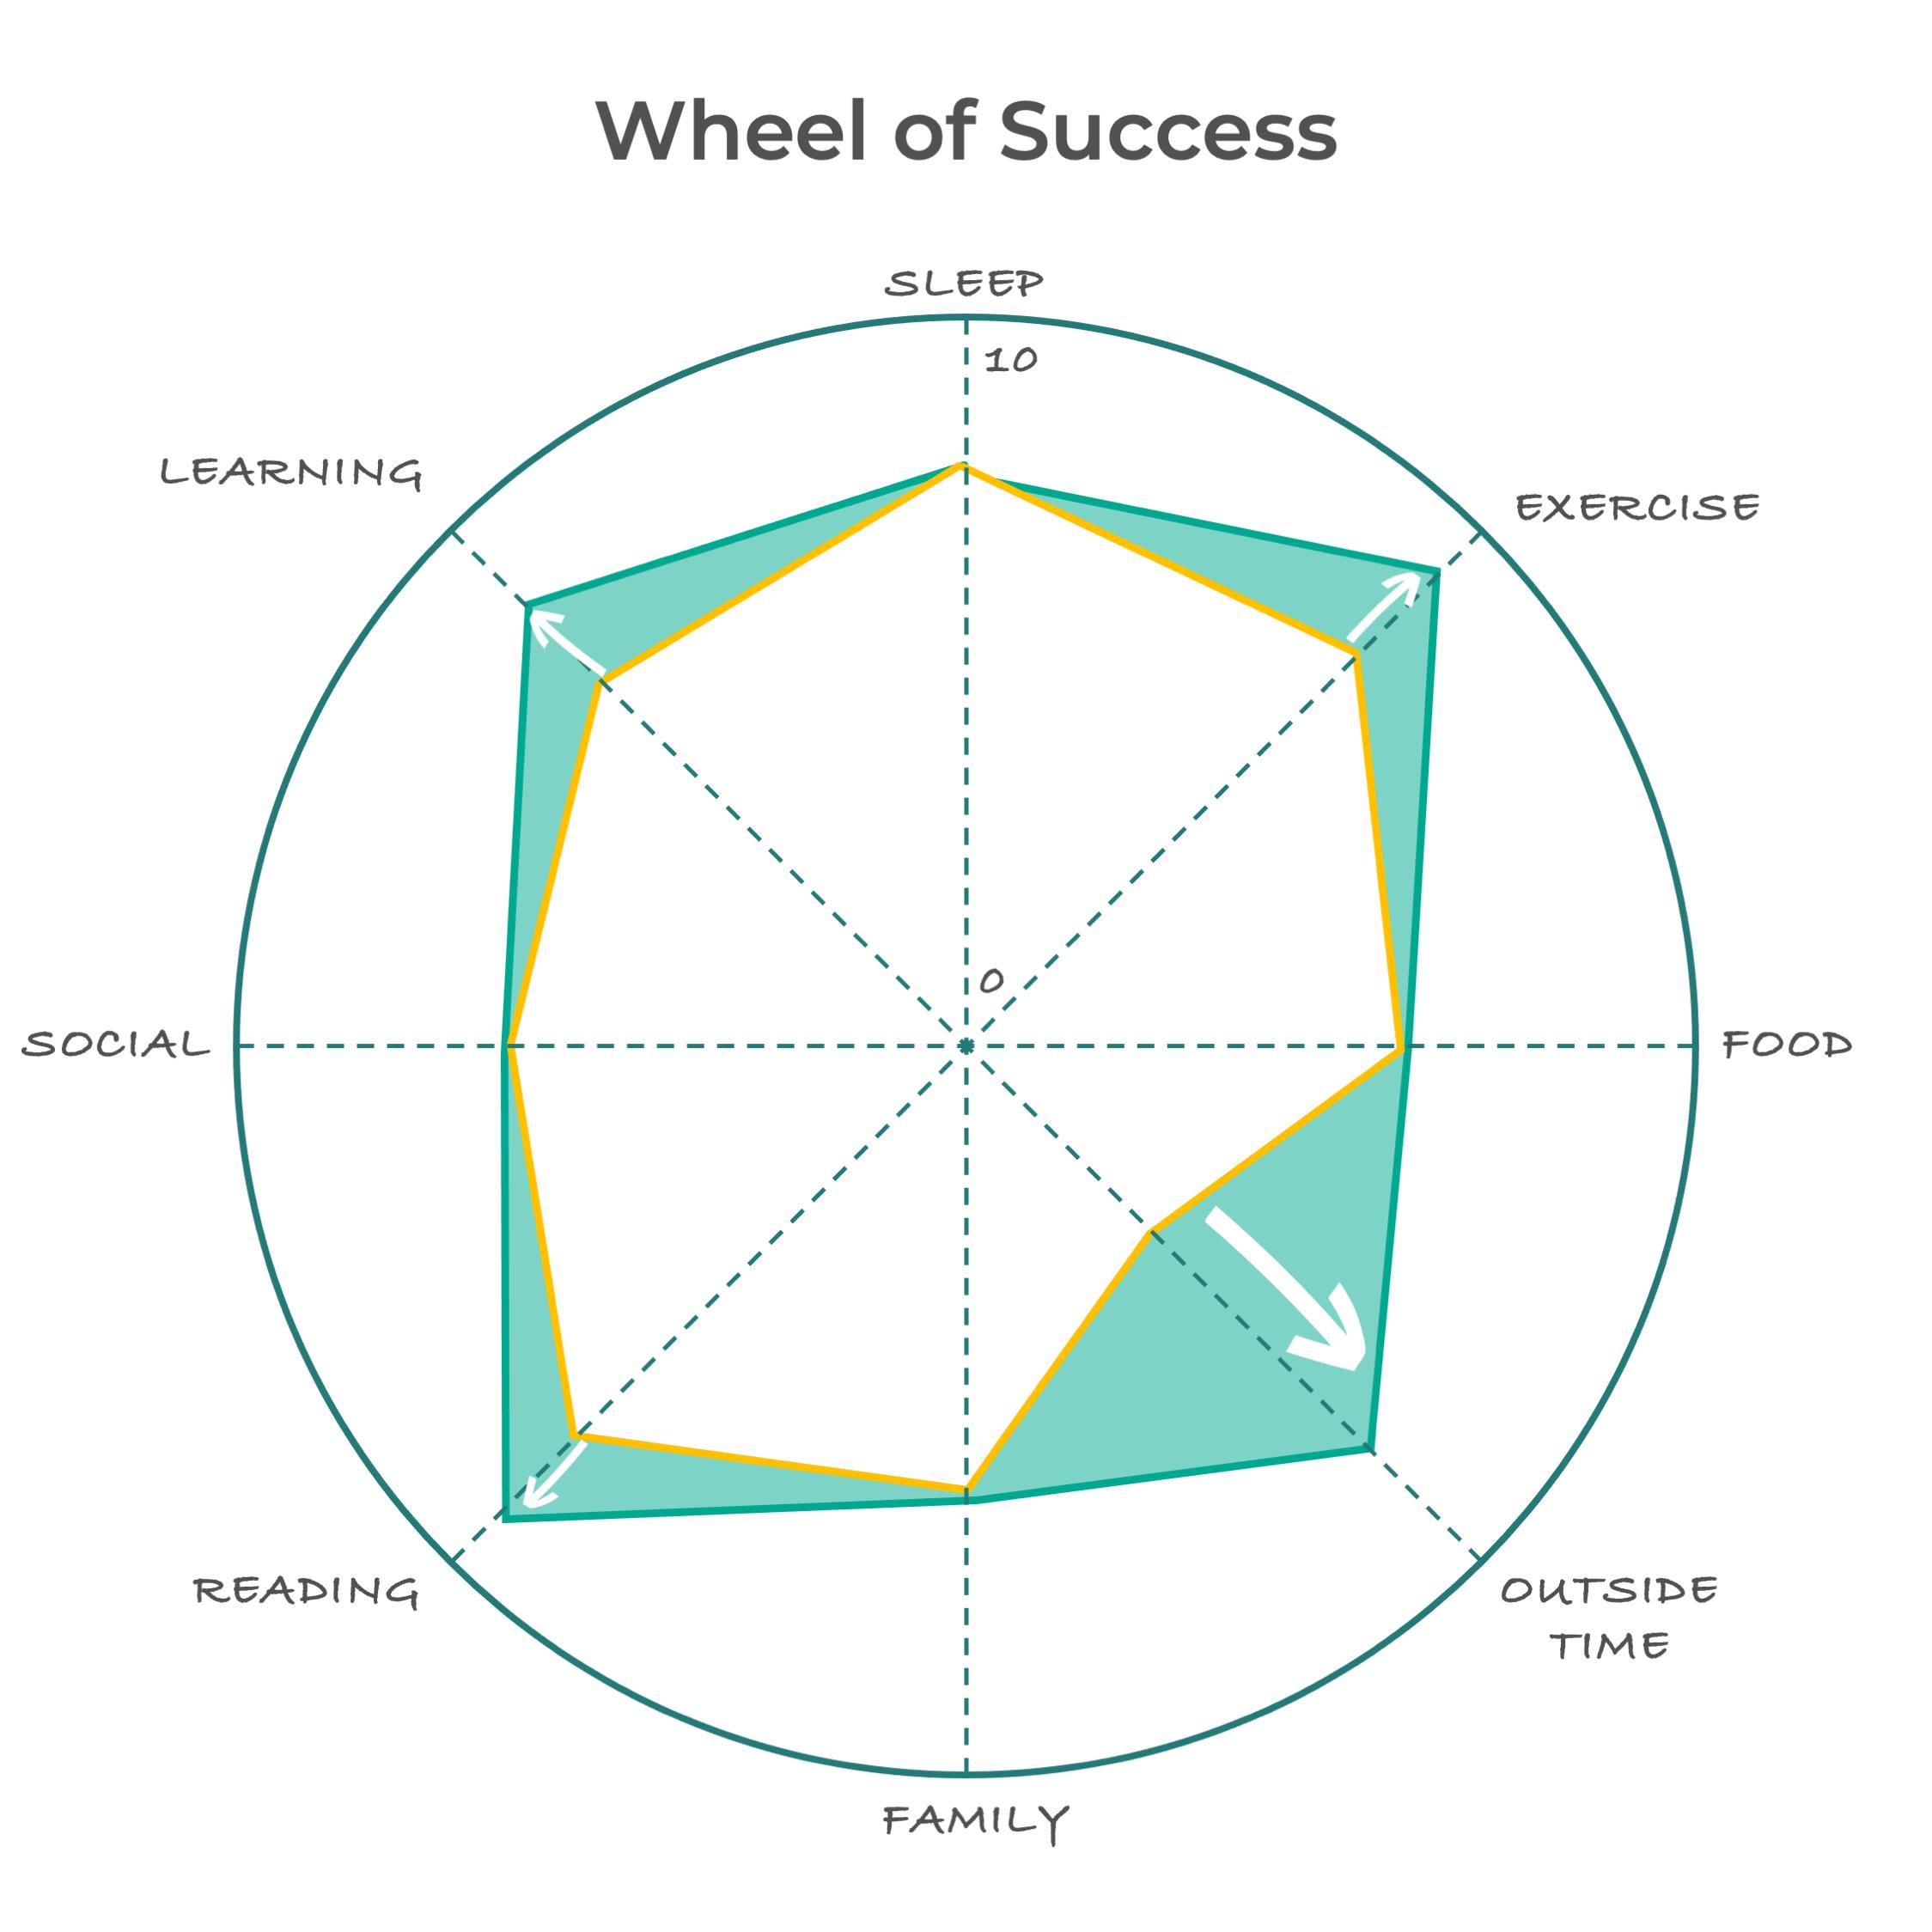 Wheel of Success